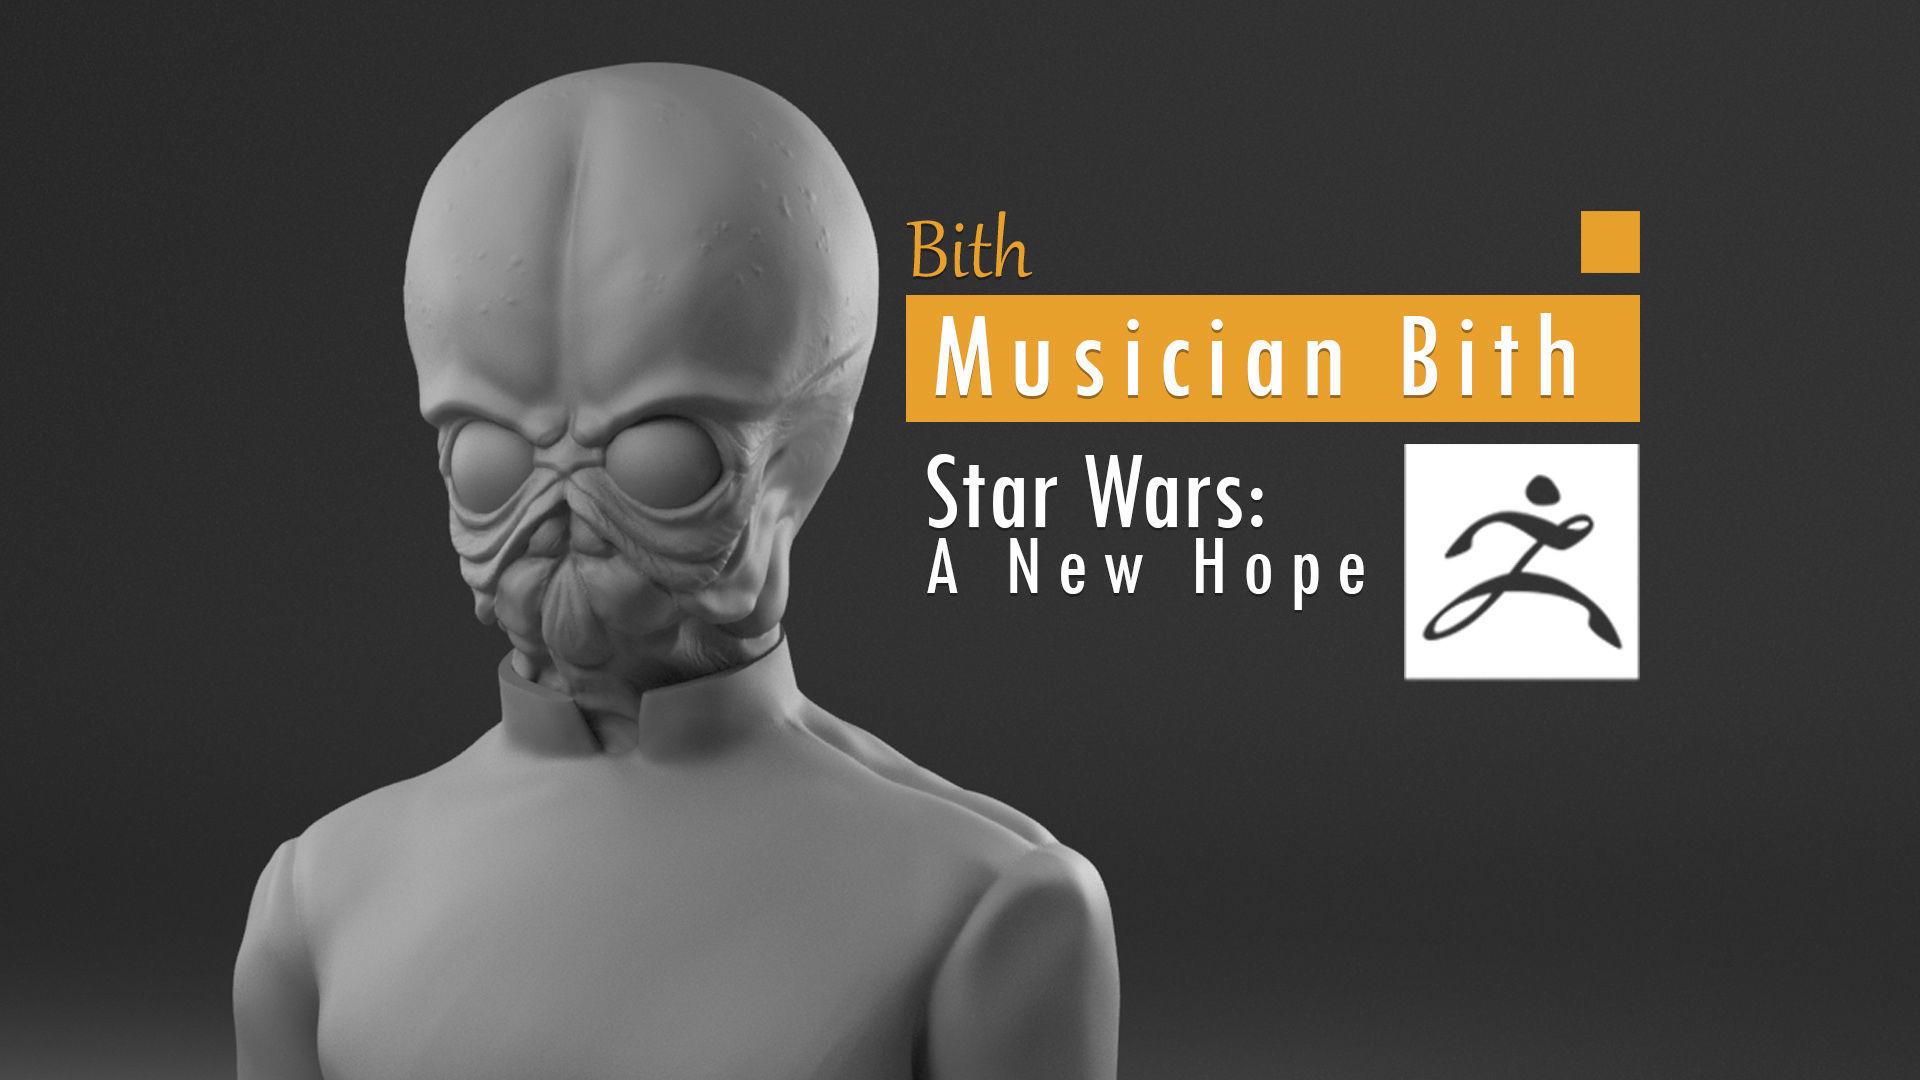 Bith - Bith musician Mos Eisley cantina - Star Wars A new hope